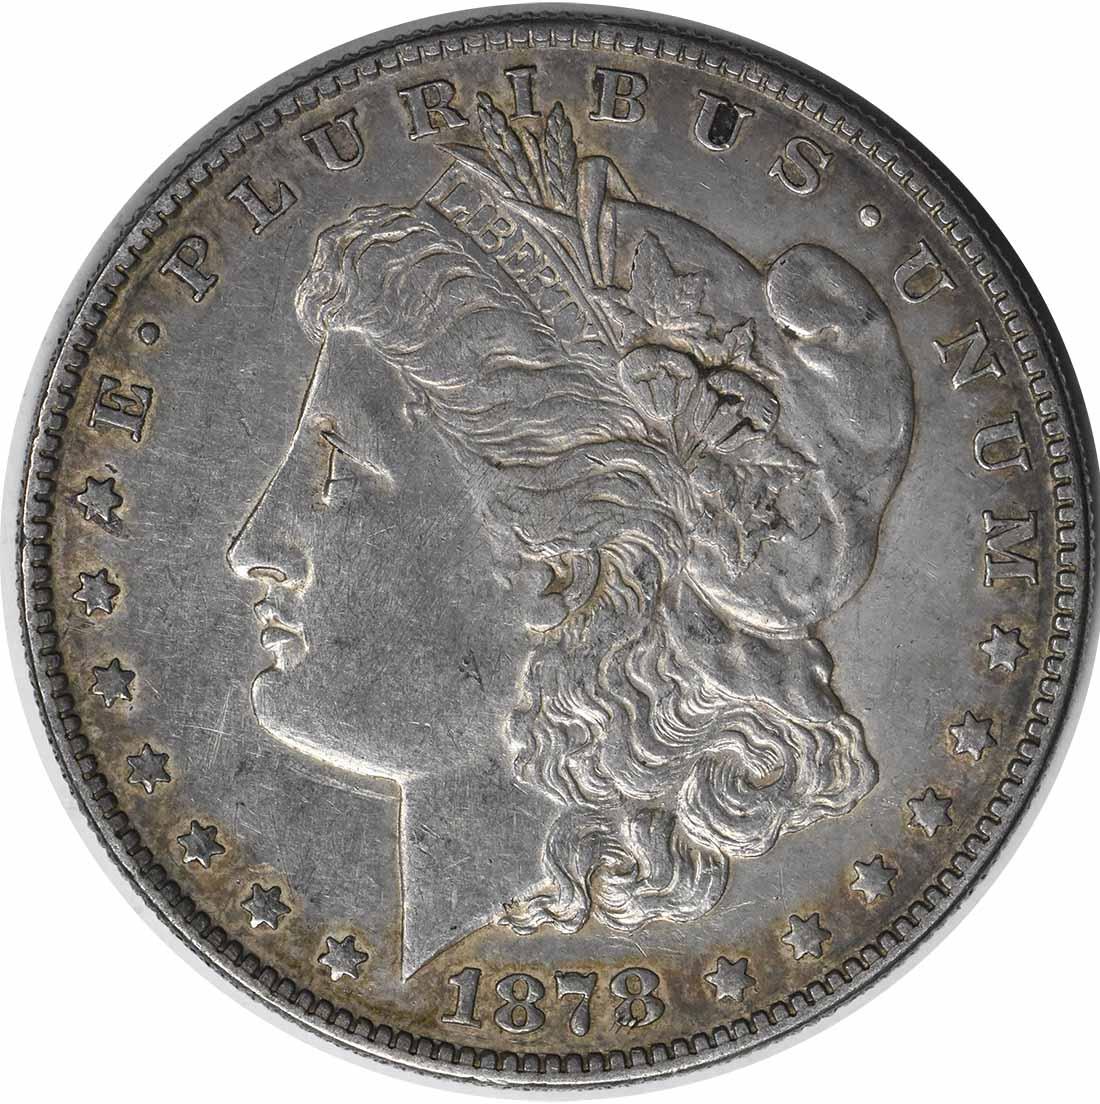 1878-S VAM 81 Morgan Silver Dollar EF Uncertified